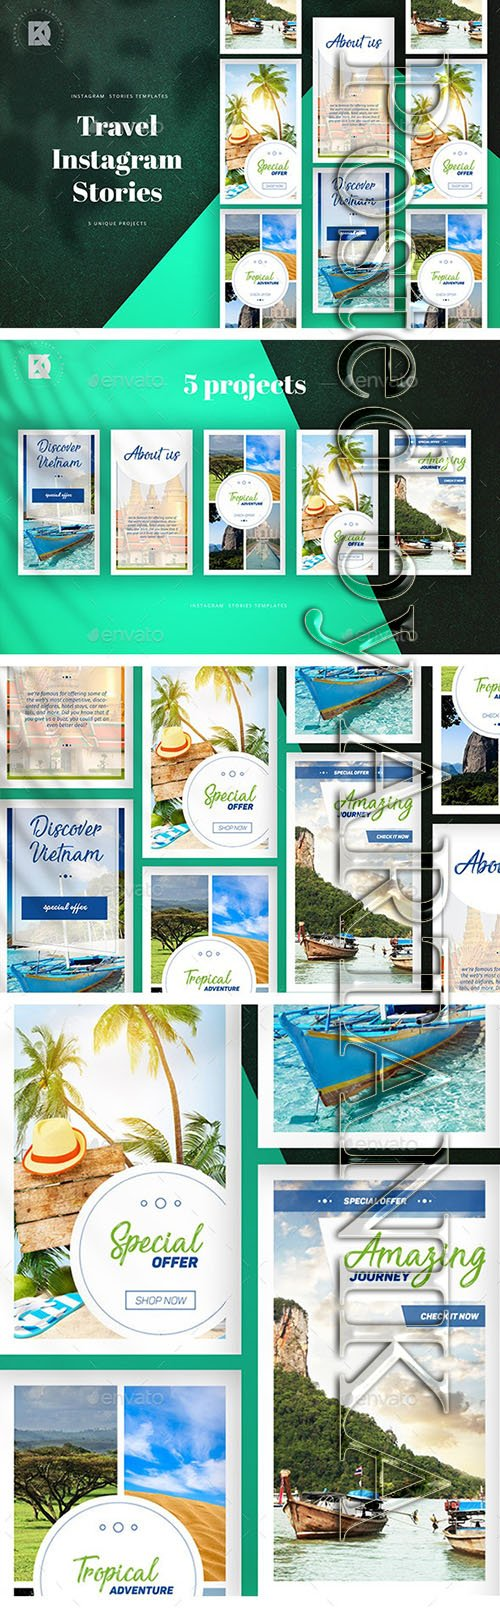 Travel Instagram Stories 23790606